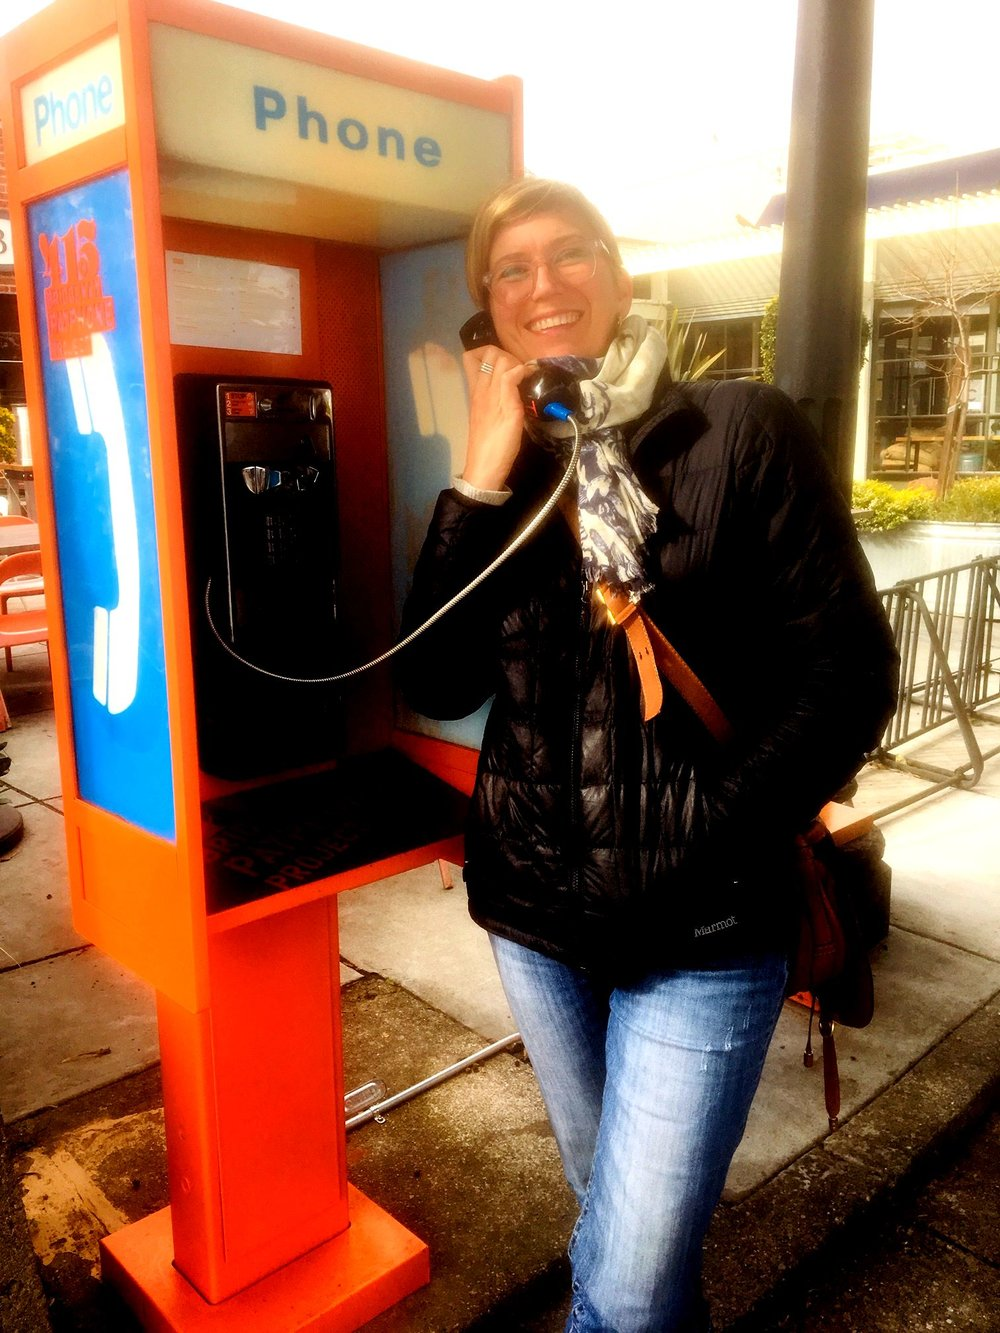 Tera Ancona checks out the payphone recordings outside Cibo.                       Photo by Larry Clinton